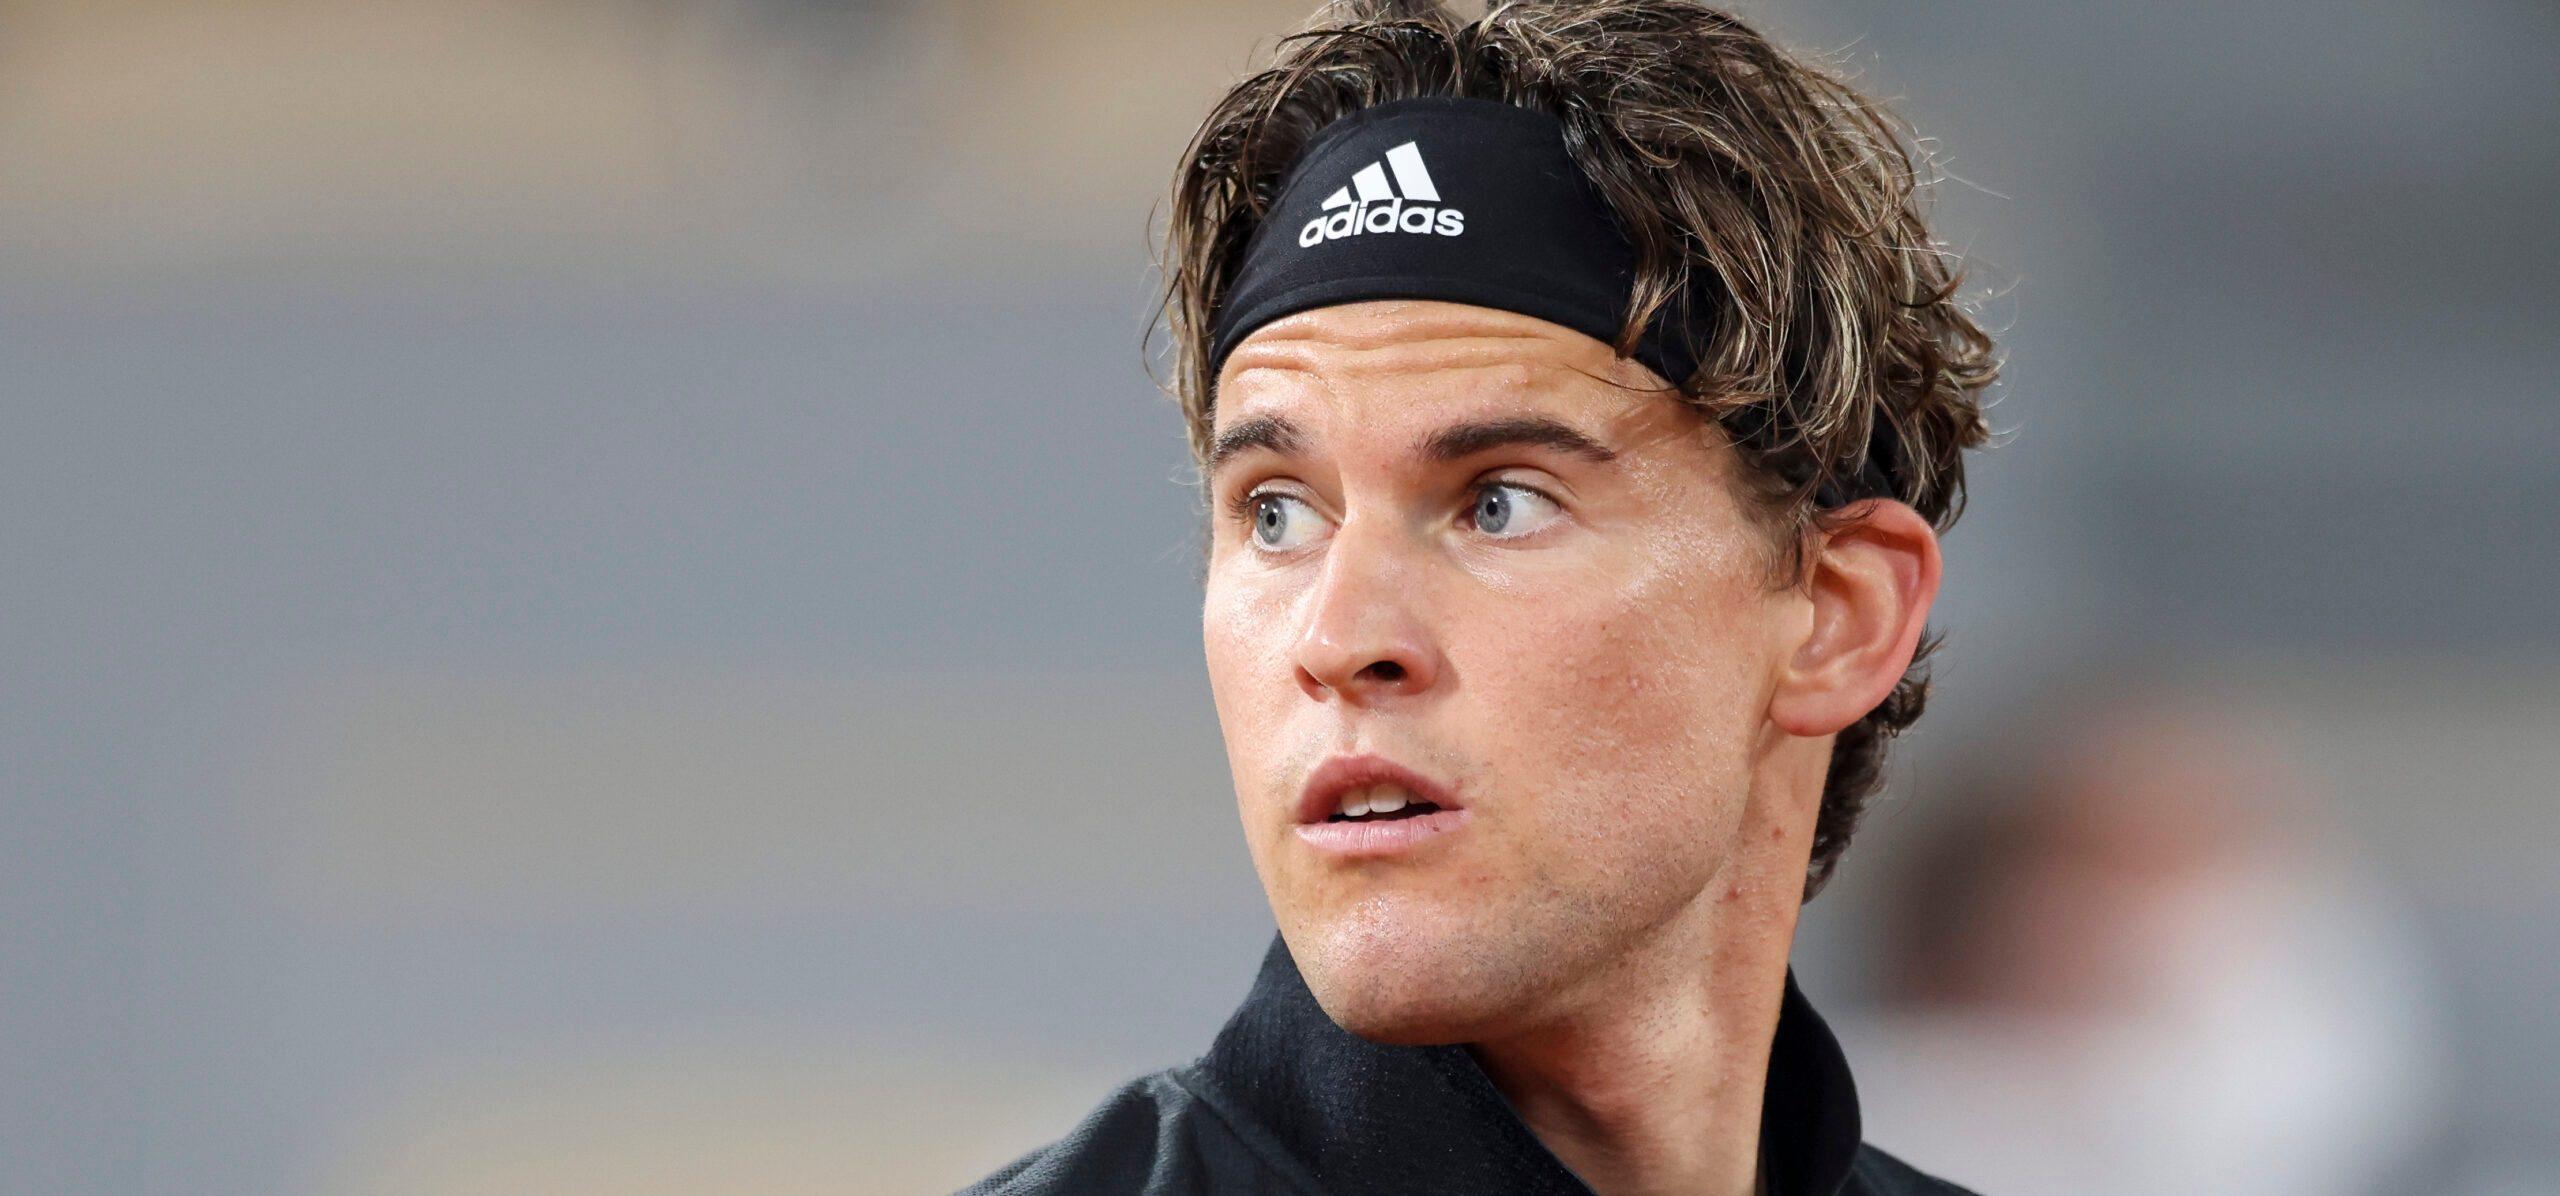 Dominic Thiem: In den Tiebreaks so cool wie Novak Djokovic